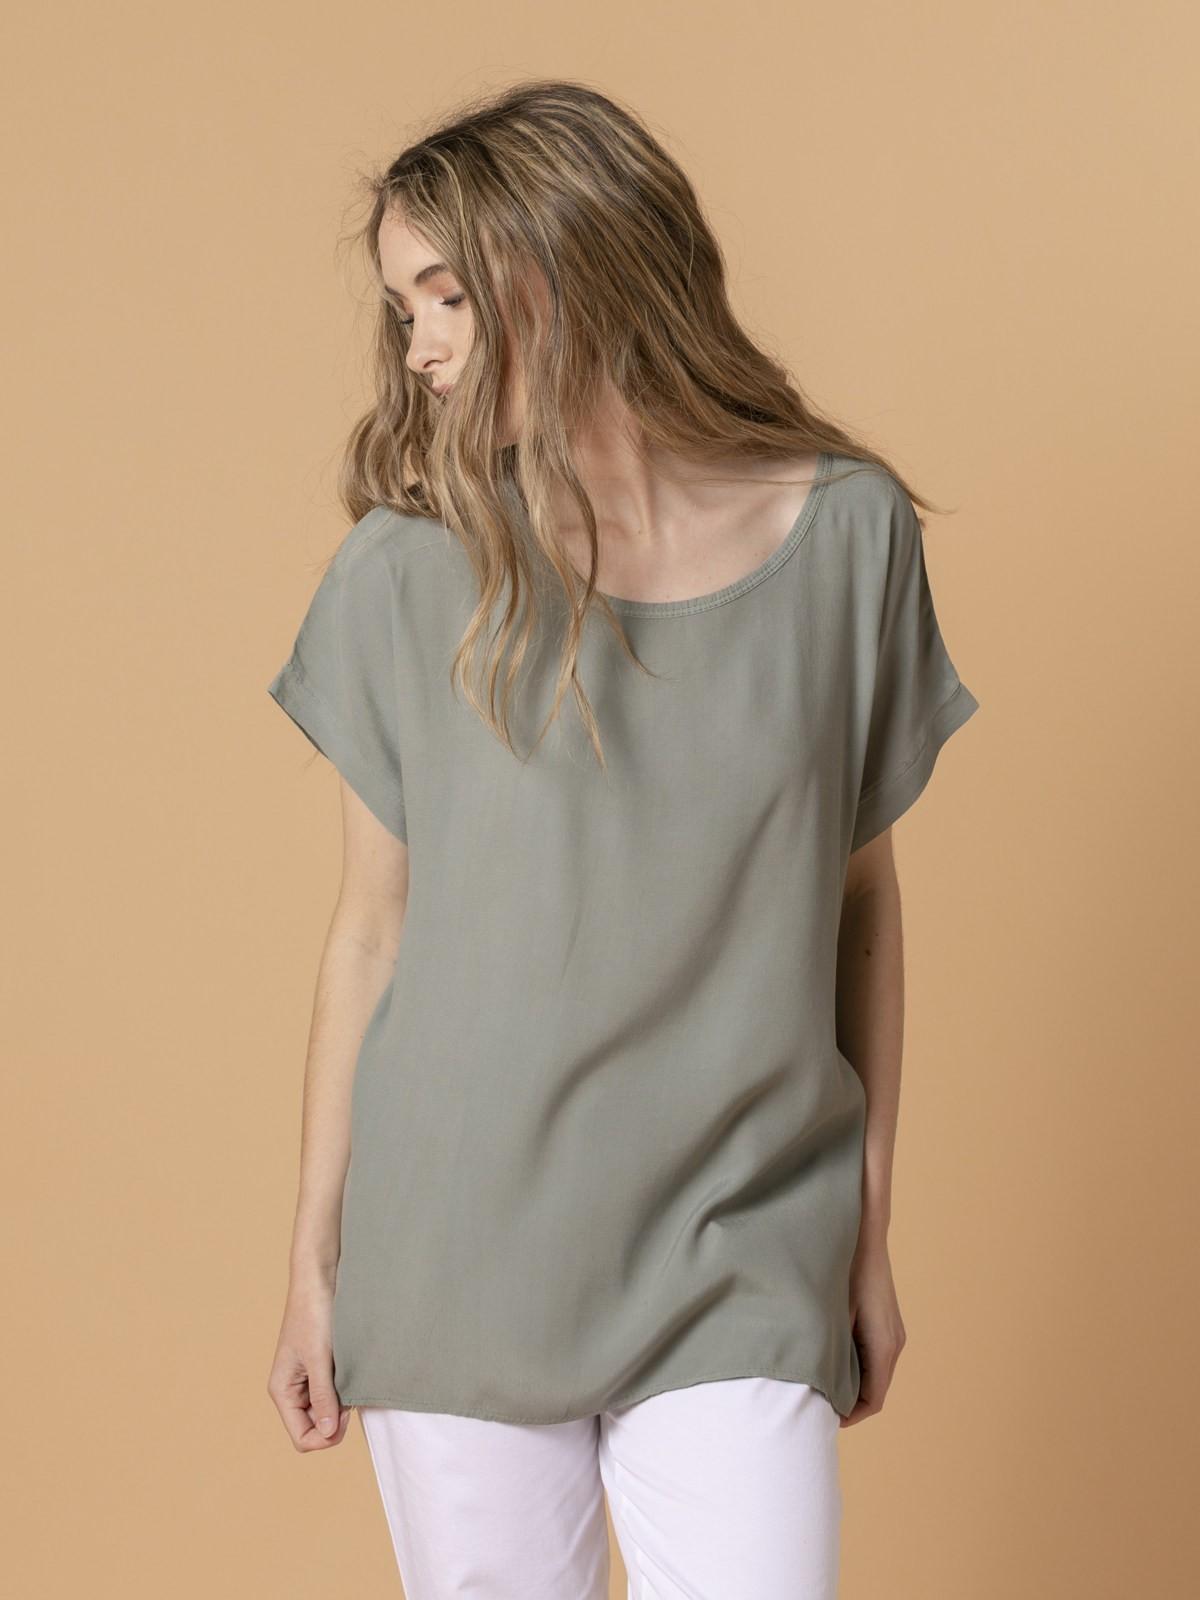 Blusa de mujer manga corta Caqui